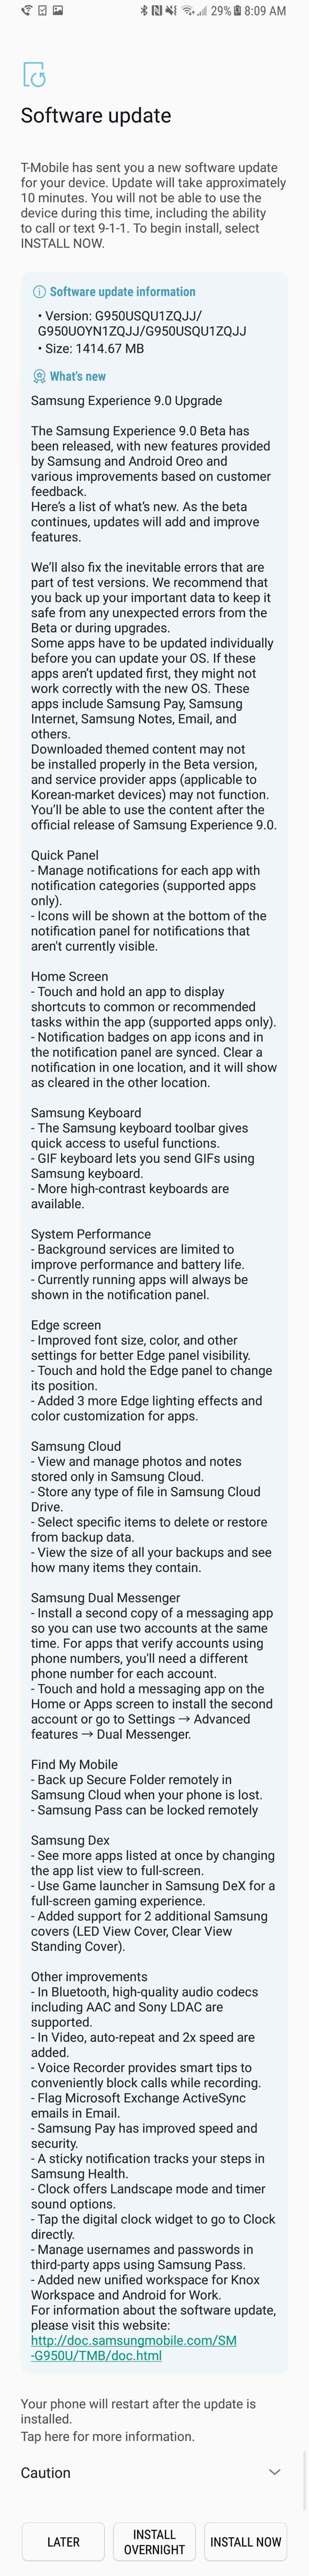 Samsung запустила бета-тестирование Android 8.0 для Galaxy S8 и S8+